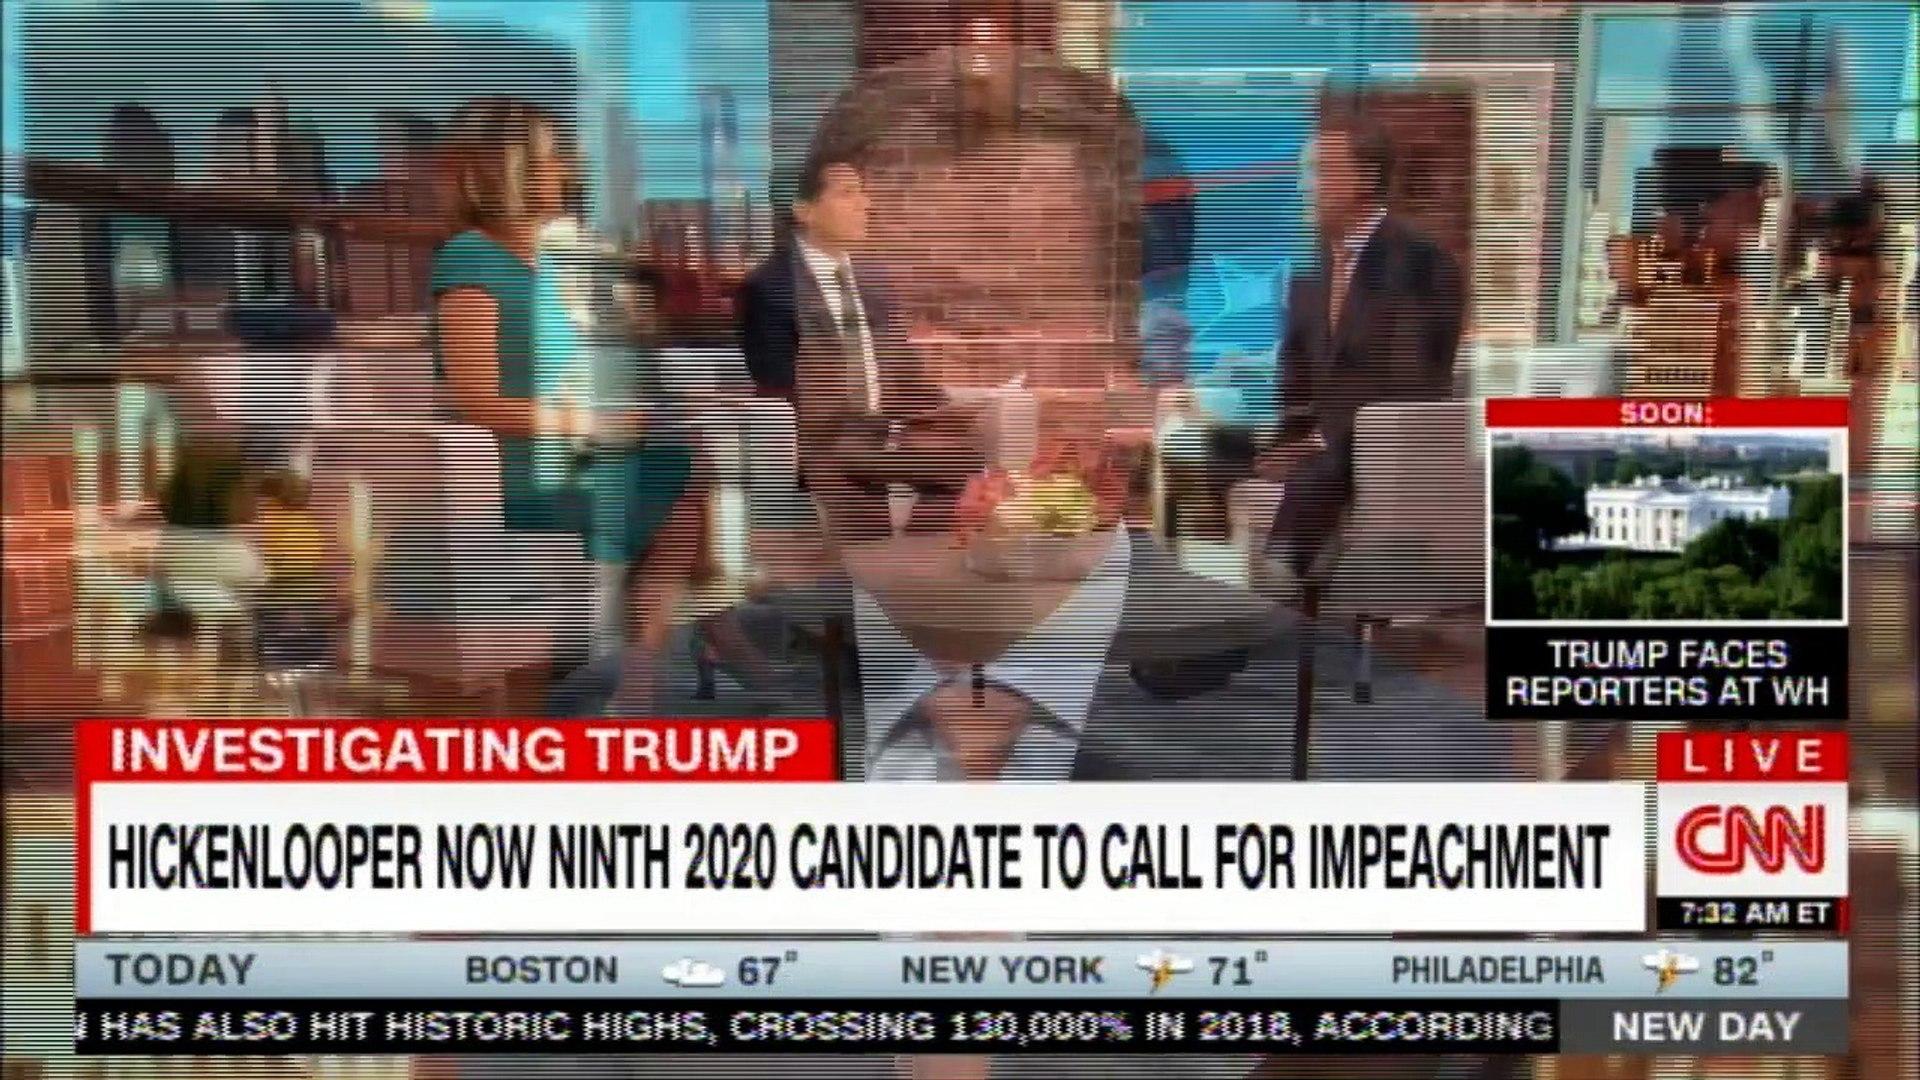 Gov. John Hickenlooper live on New Day. #Election2020 #DonaldTrump #Breaking